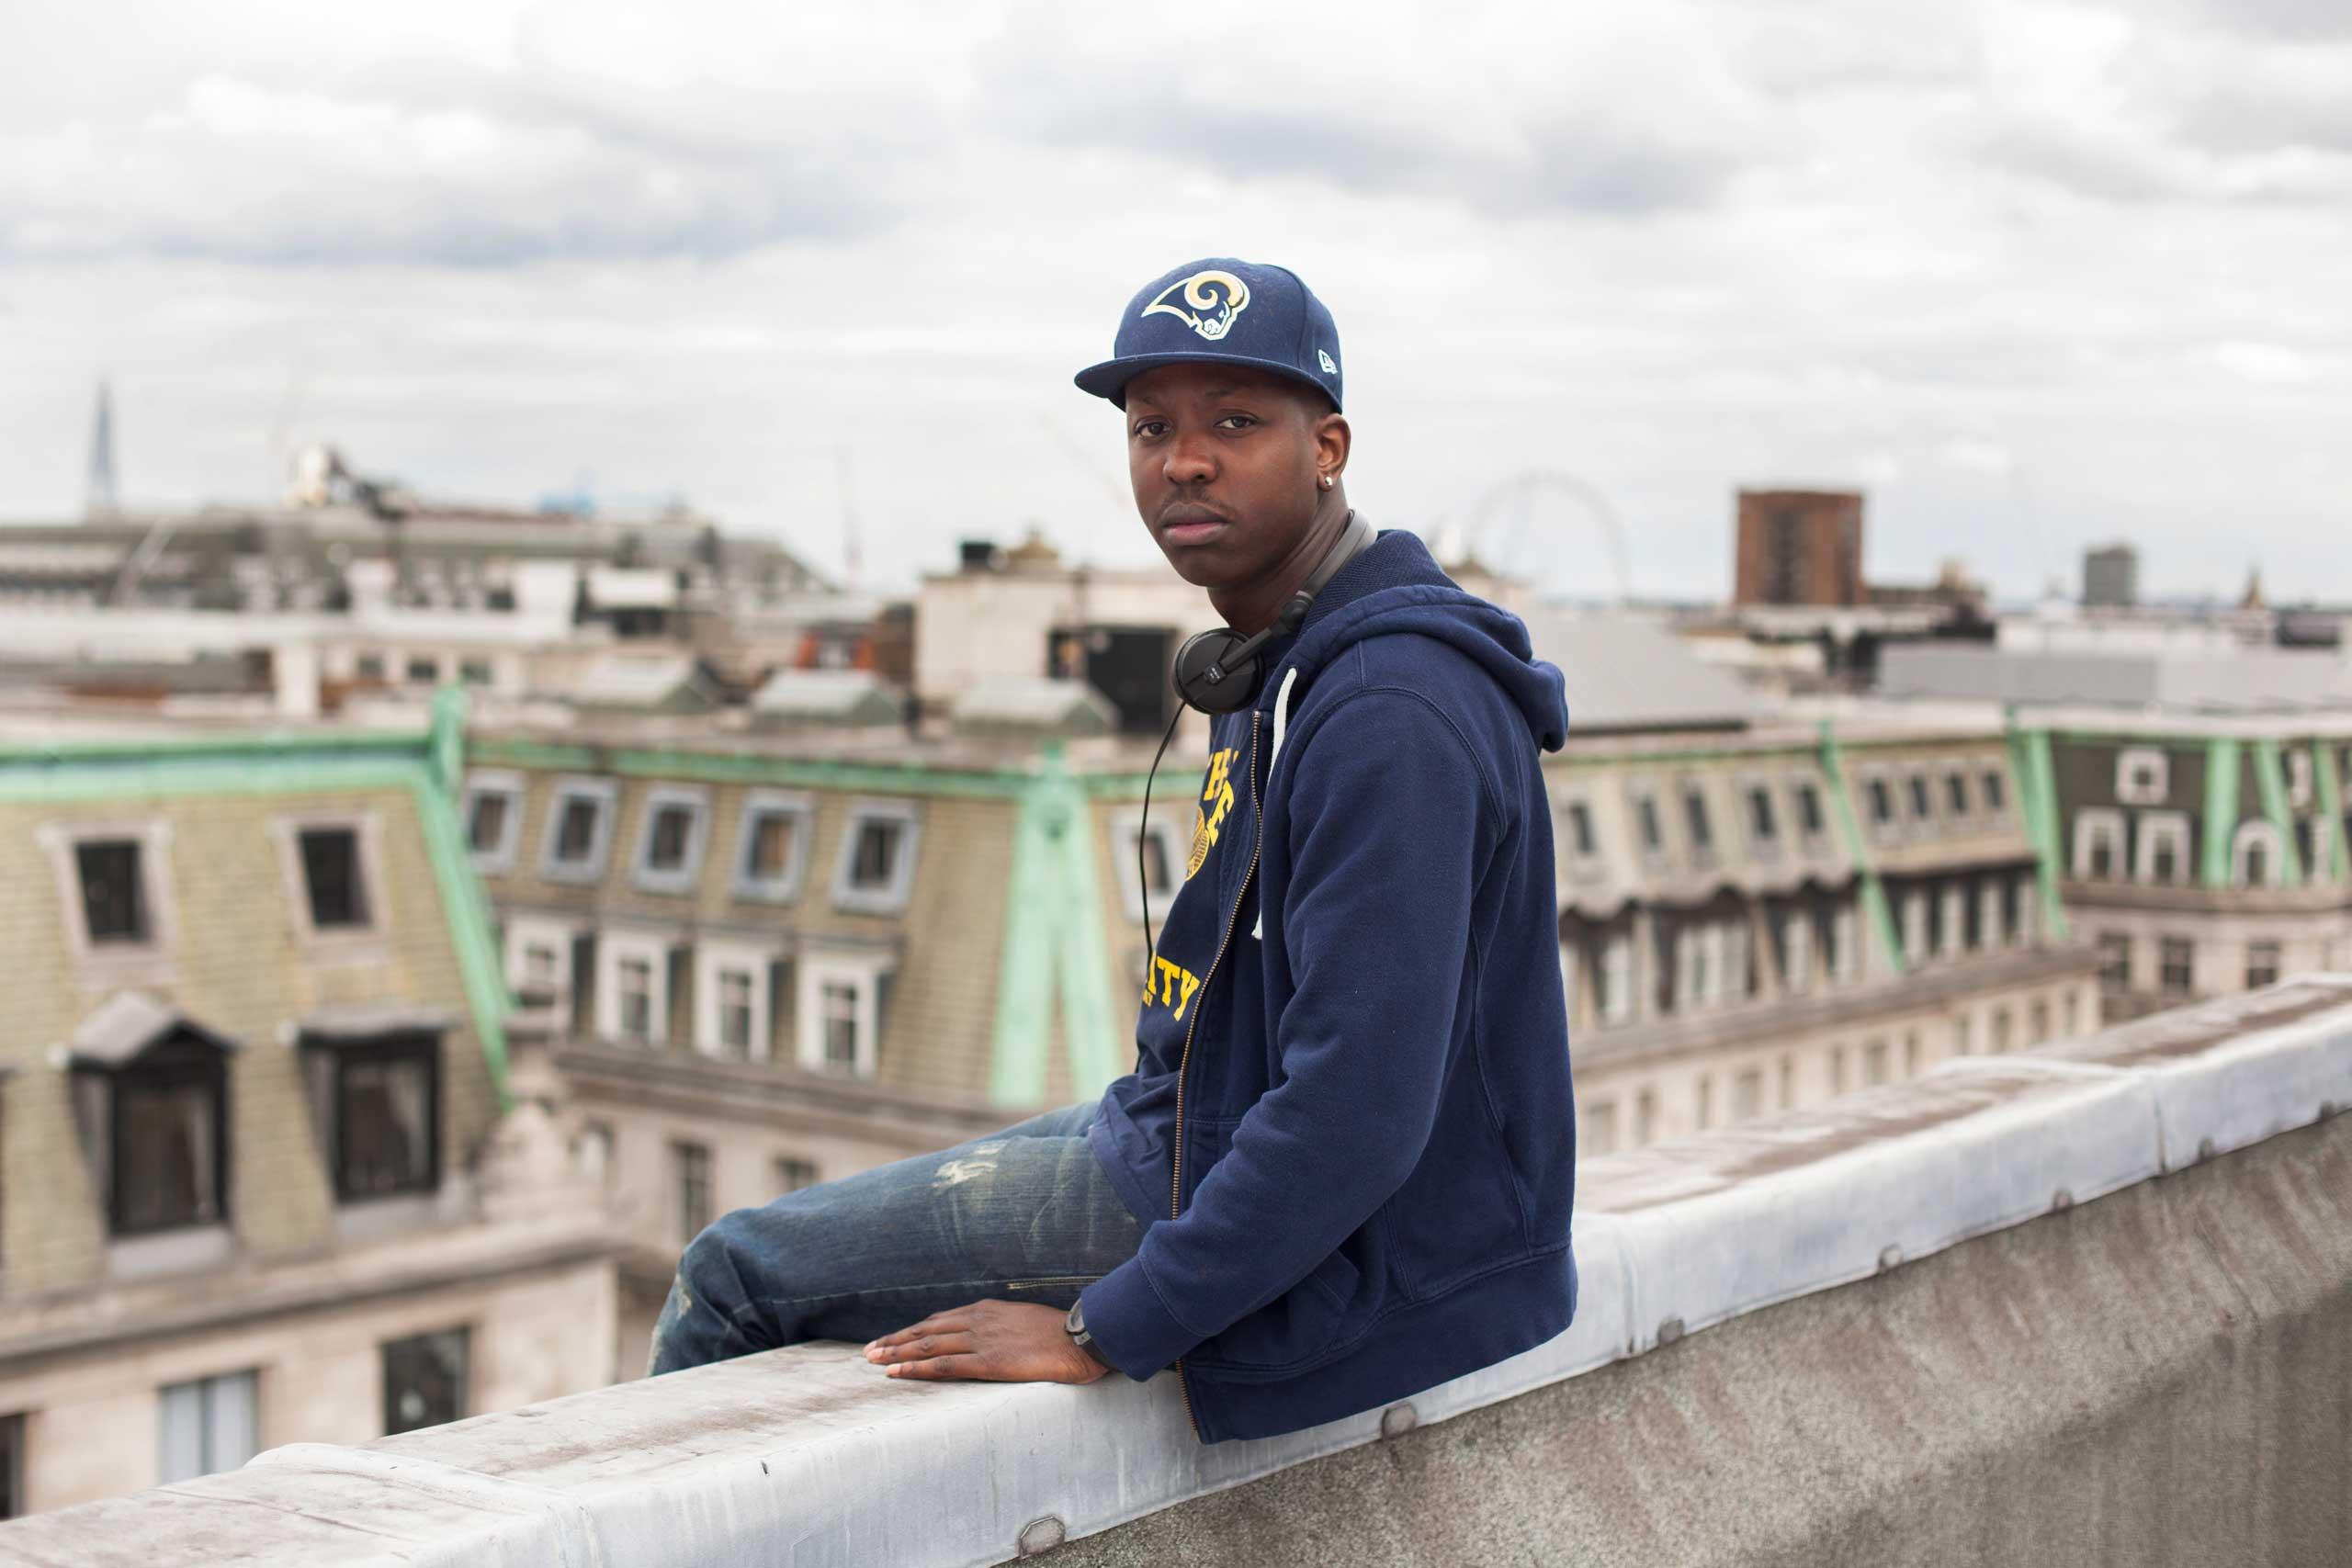 Self-made music video mogul Jamal Edwards in London on Aug. 21, 2014.